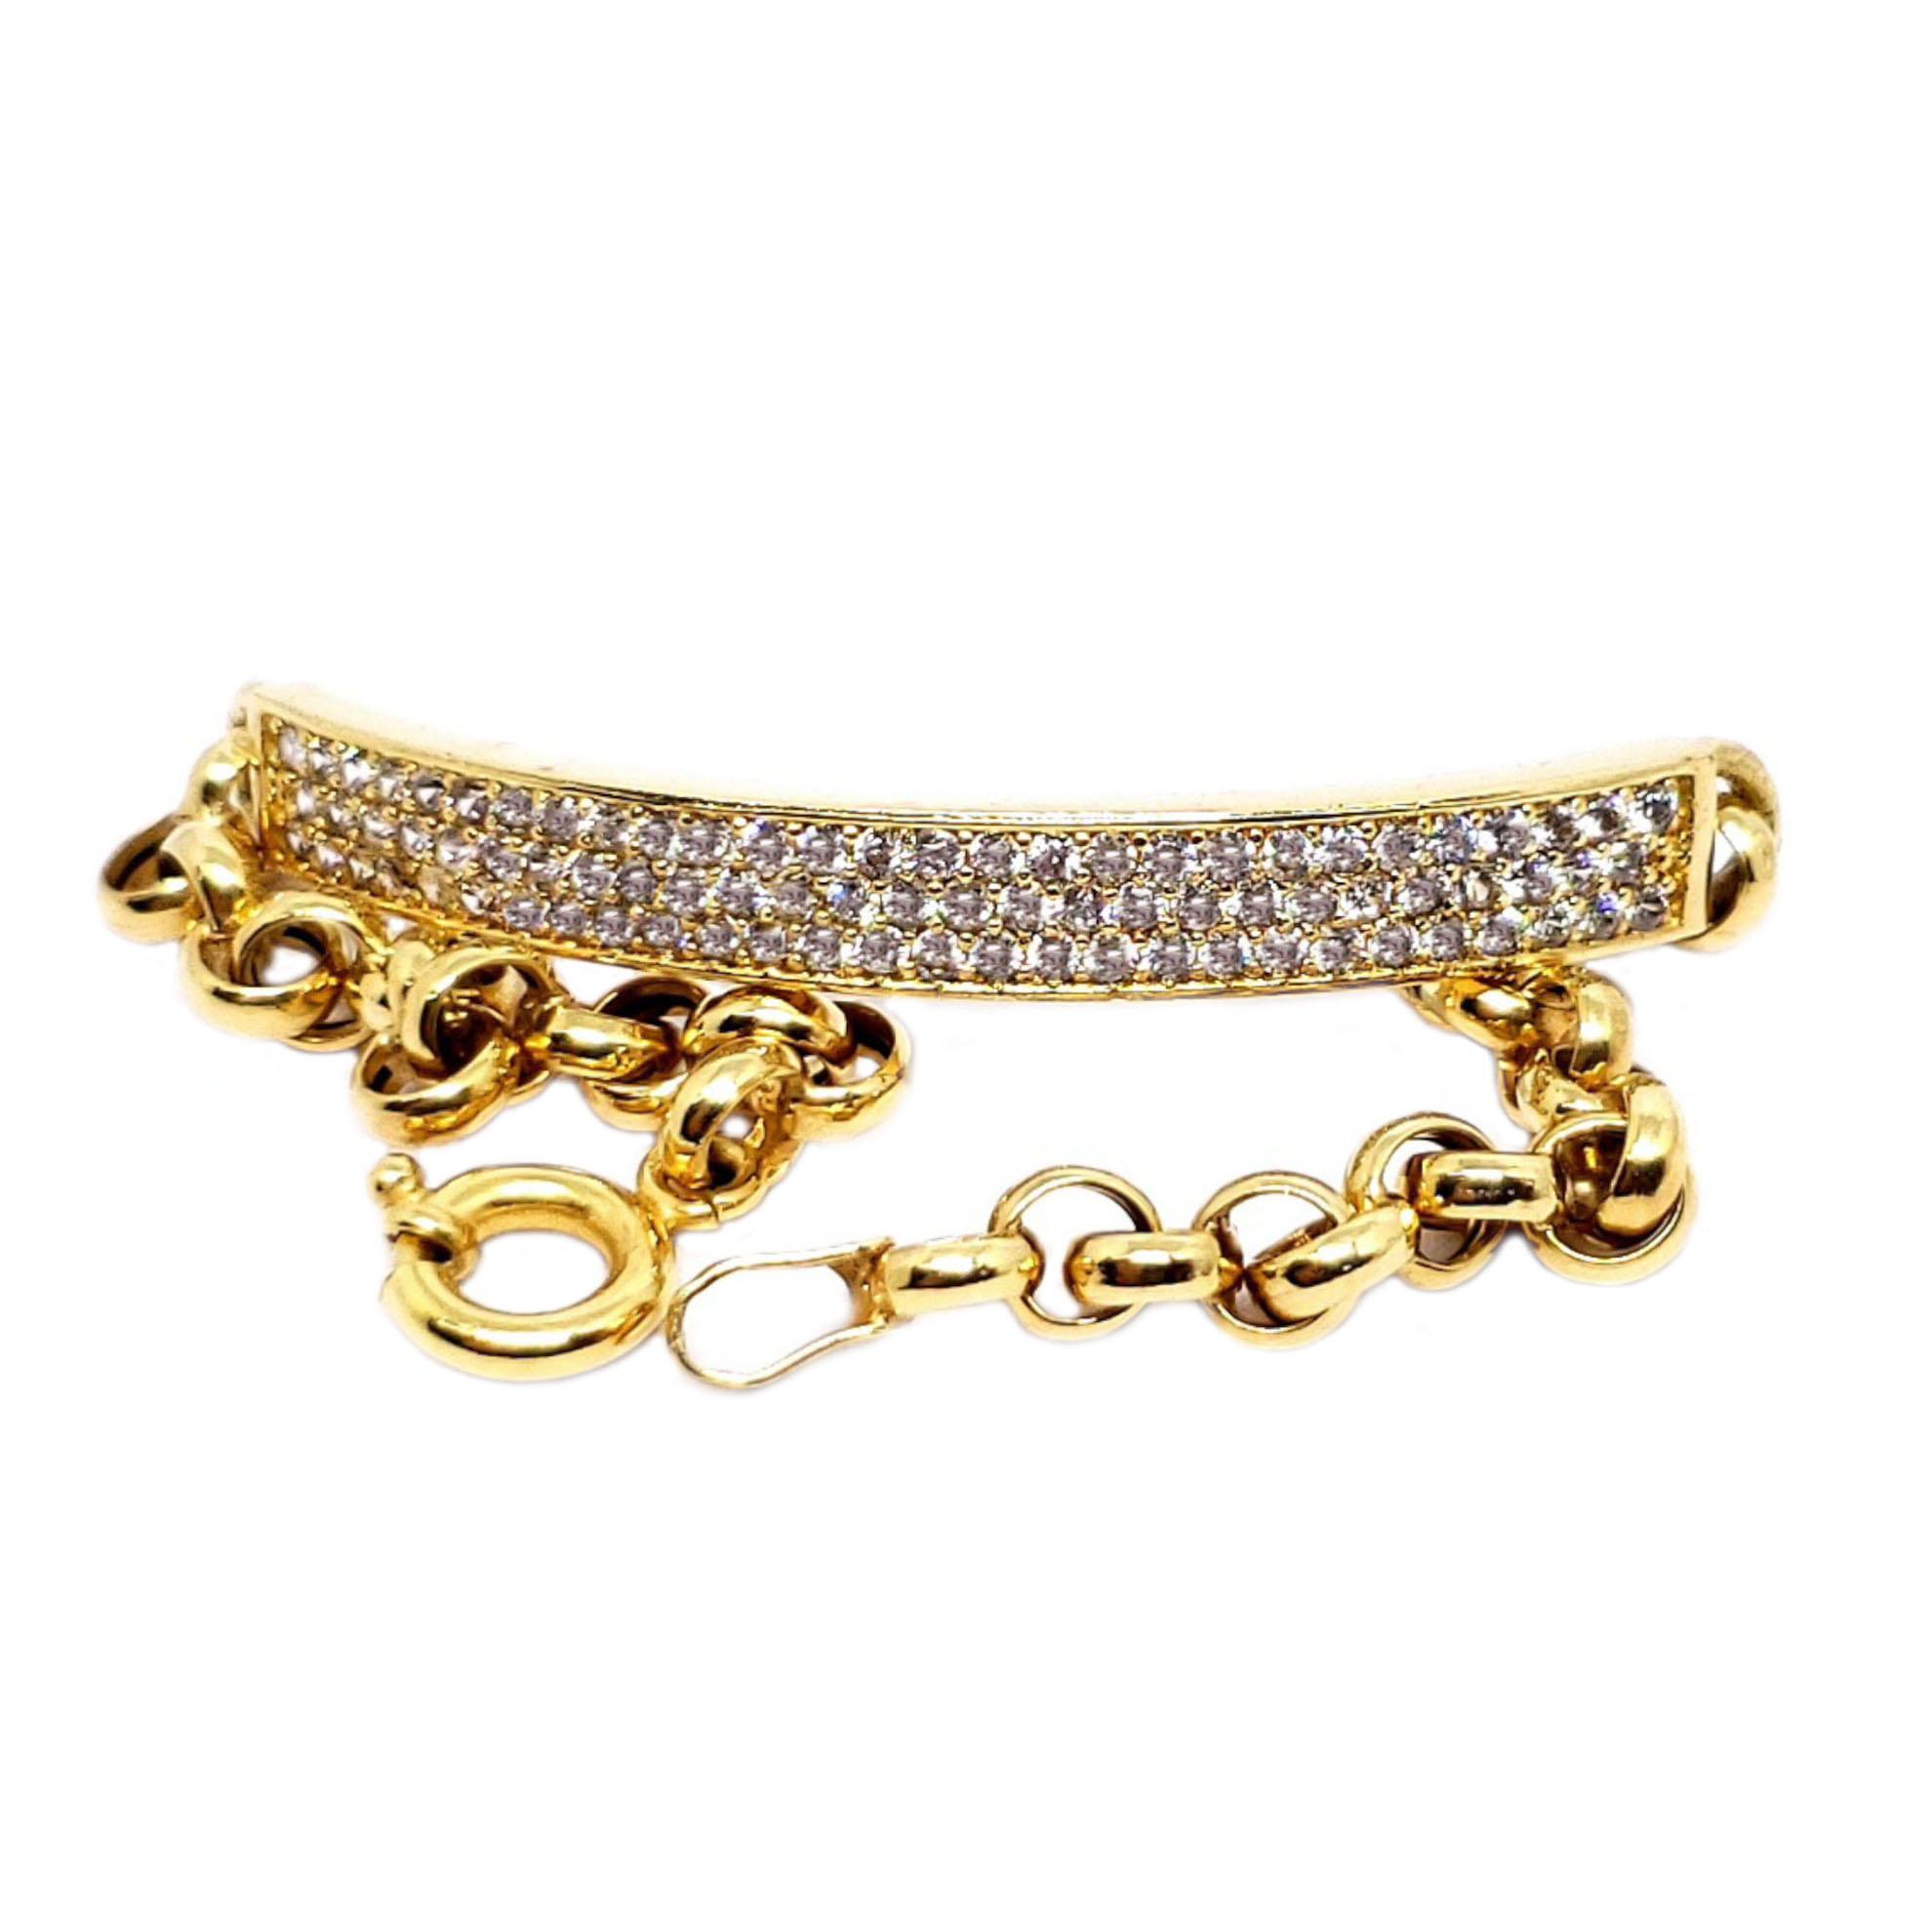 Bracelete Pavê Infantil c/ Zircônias em Ouro 18 Kilates